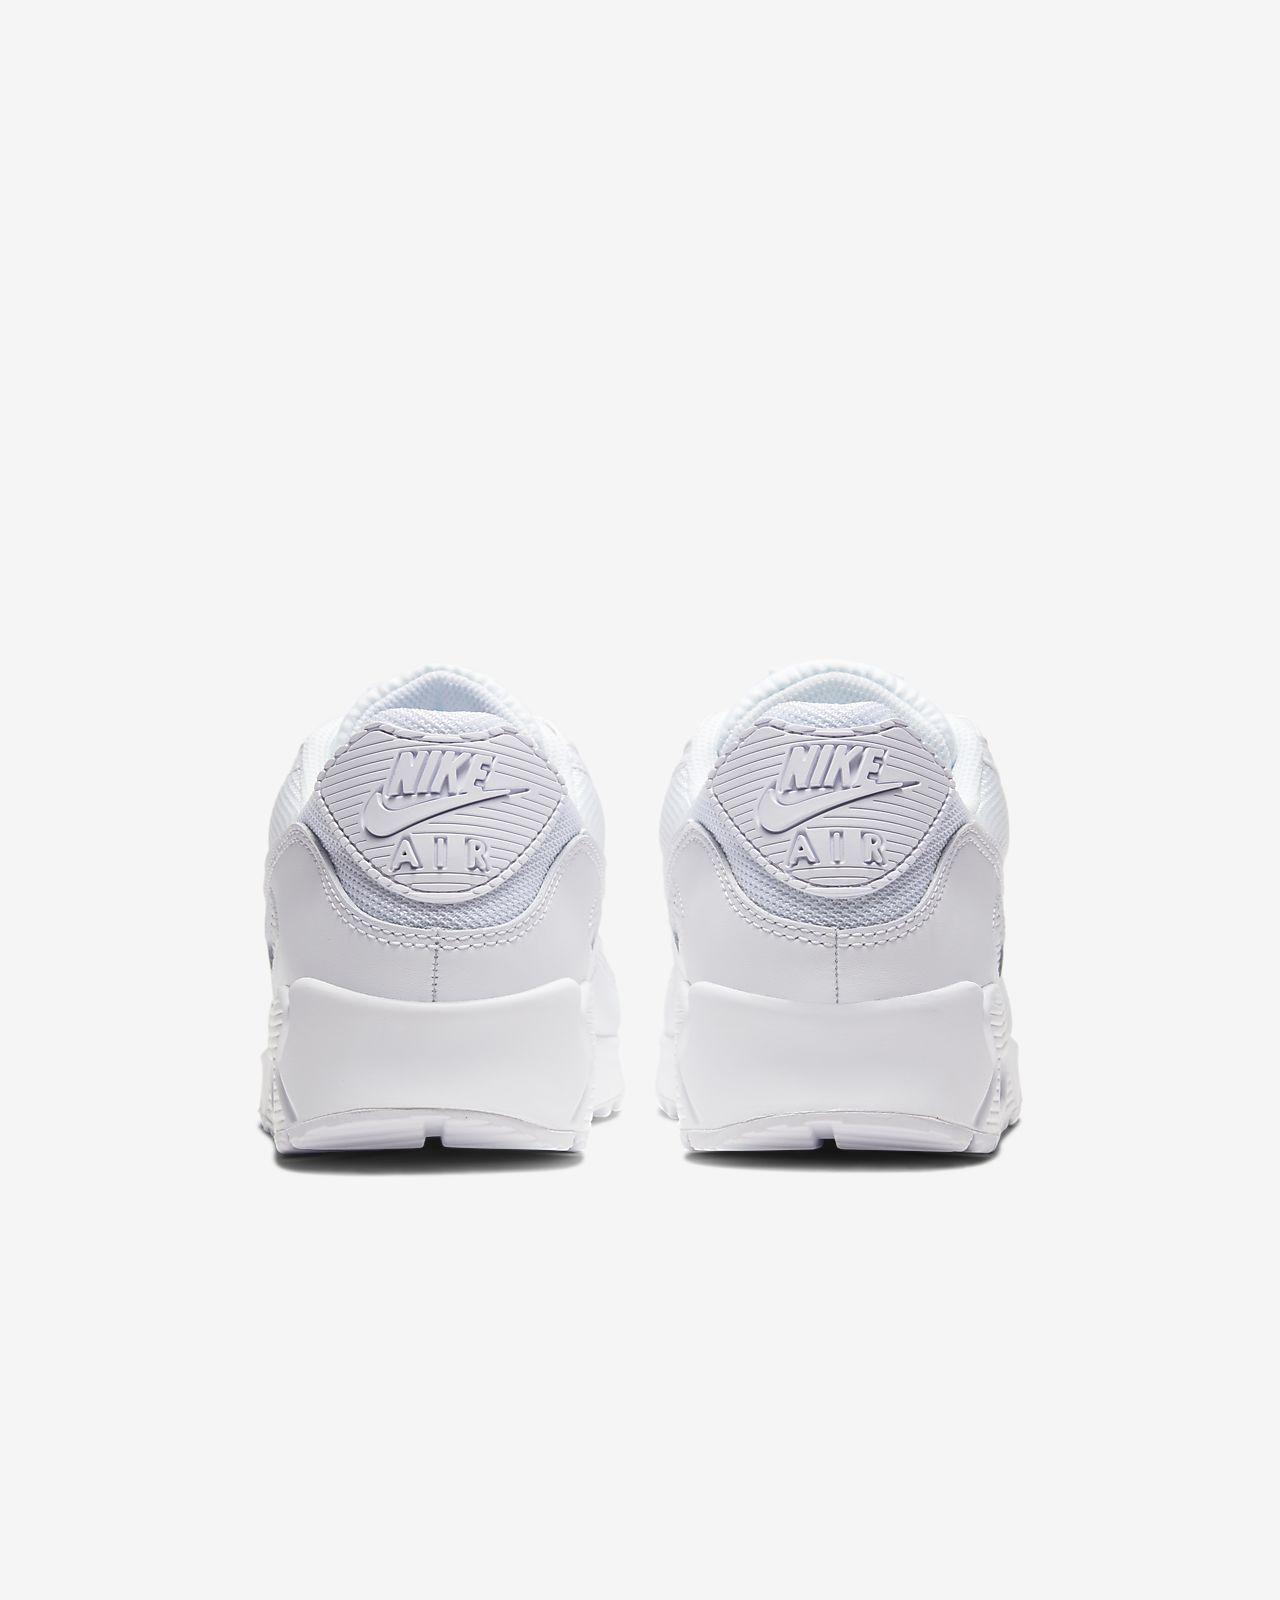 Nike Air Max 90 sko til herre